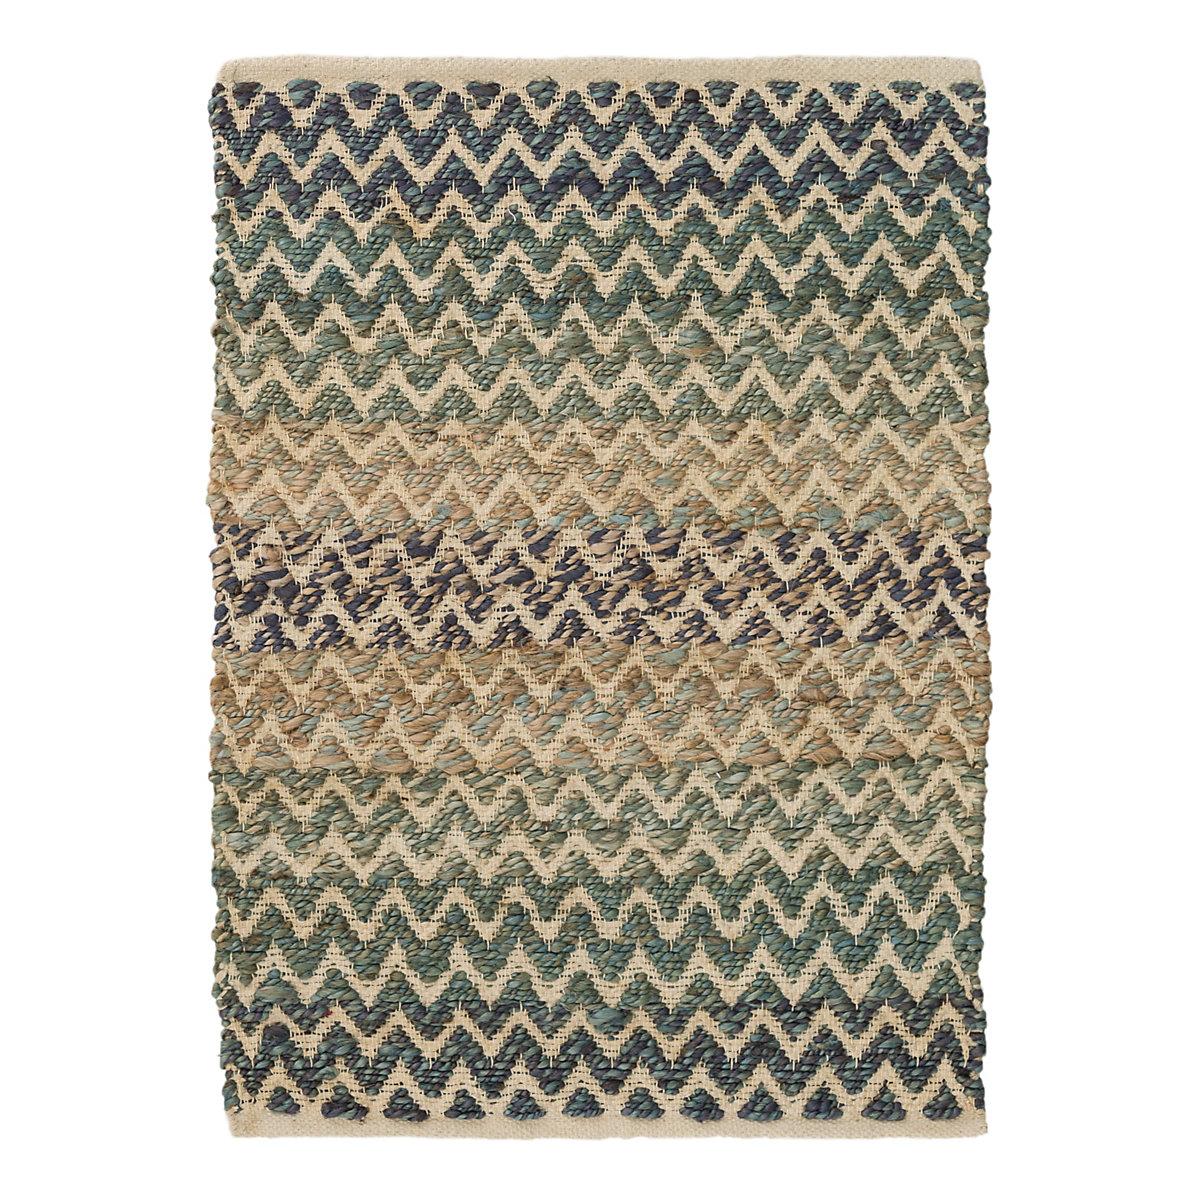 Gypsy Stripe Turquoise Grey Woven Cotton Rug: Dash & Albert Zig Zag Natural Micro Wool Hooked Rug